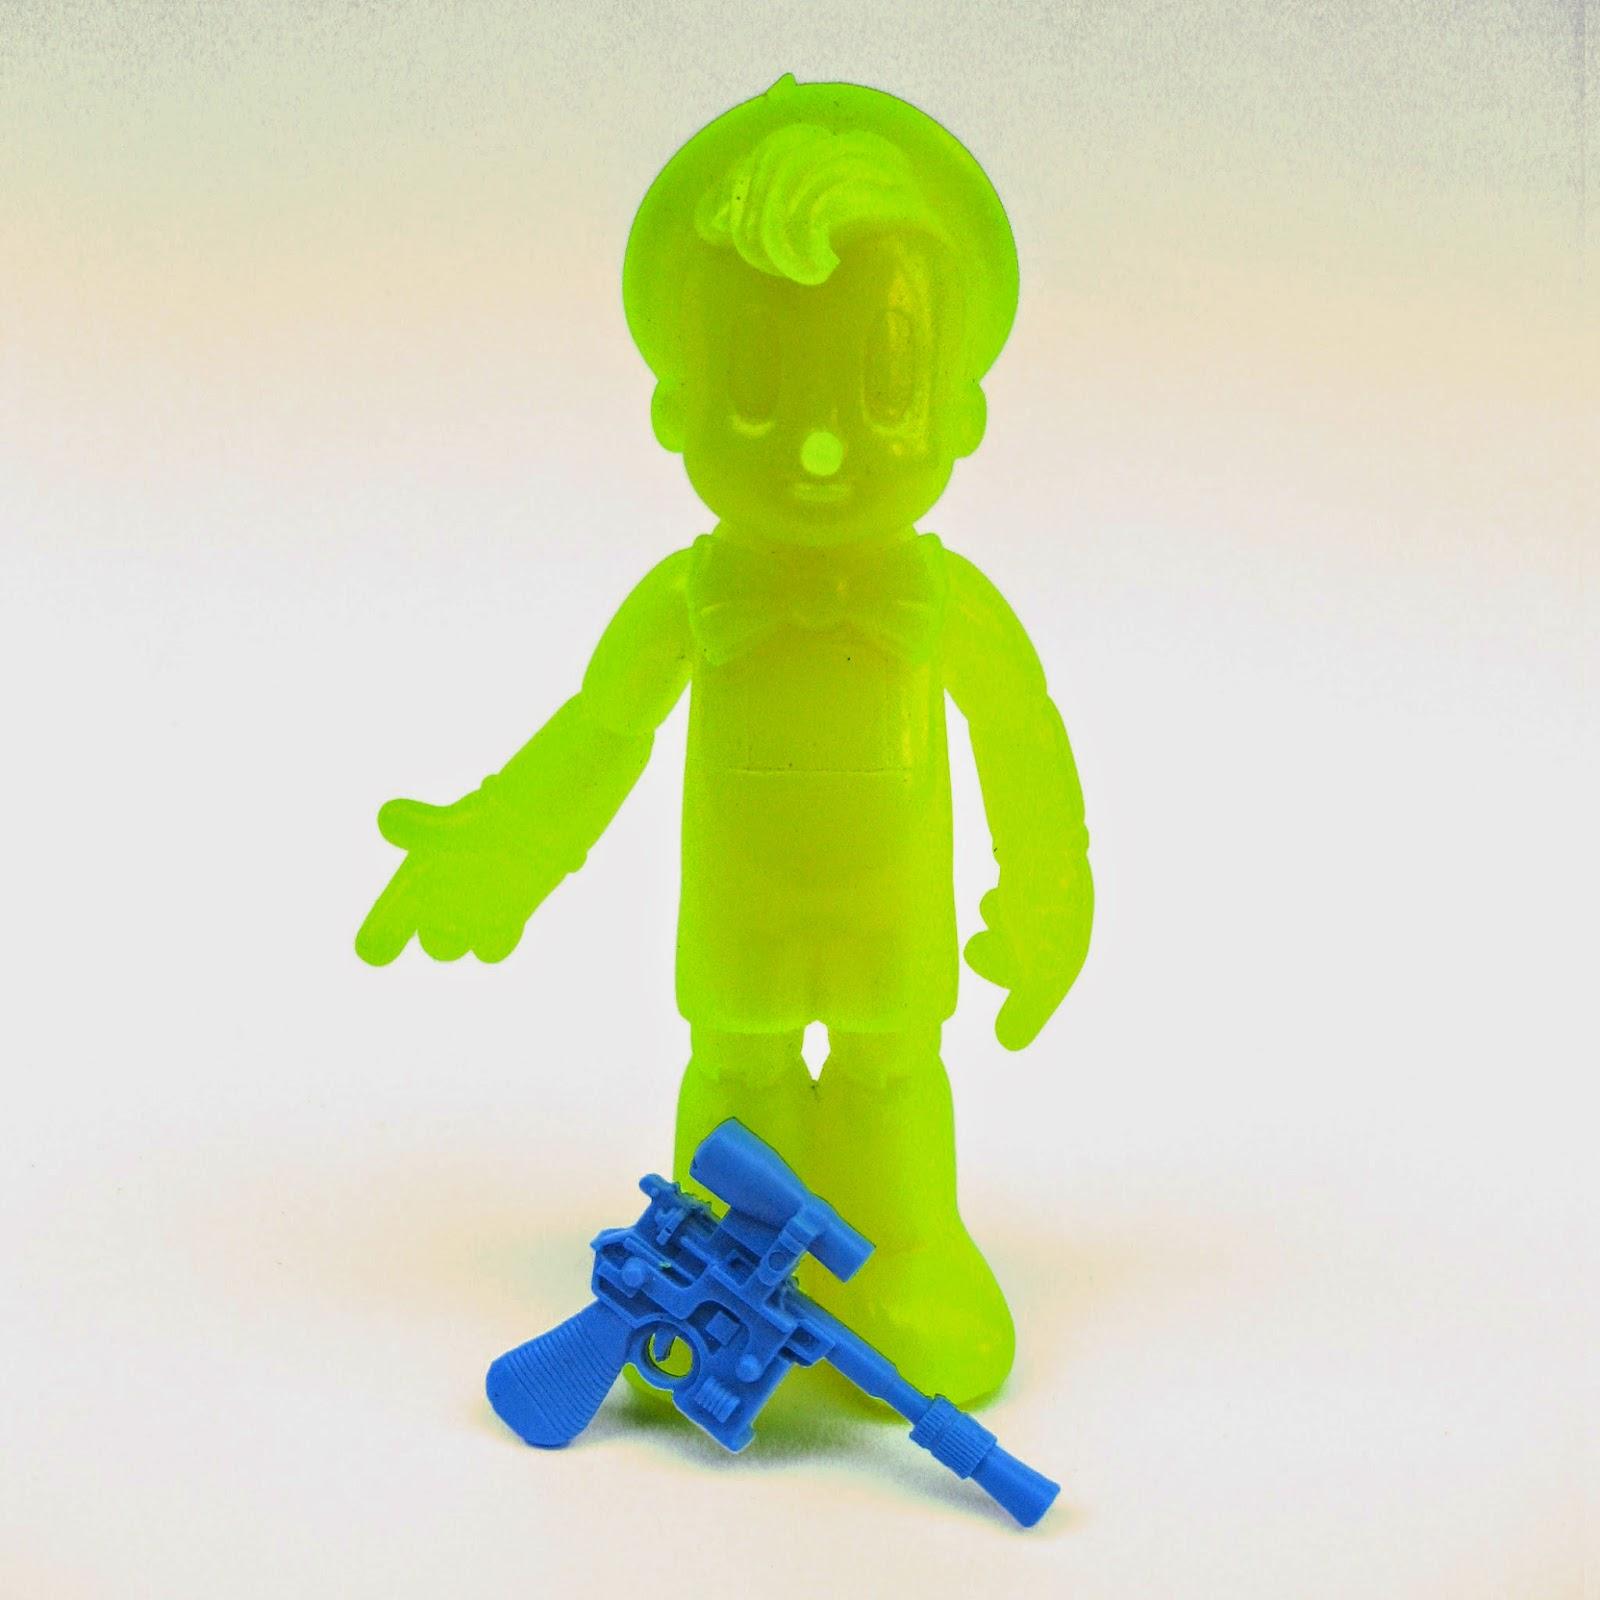 """Blacklight Yellow"" Edition Astronocchio Resin Figure by Dave Bondi"